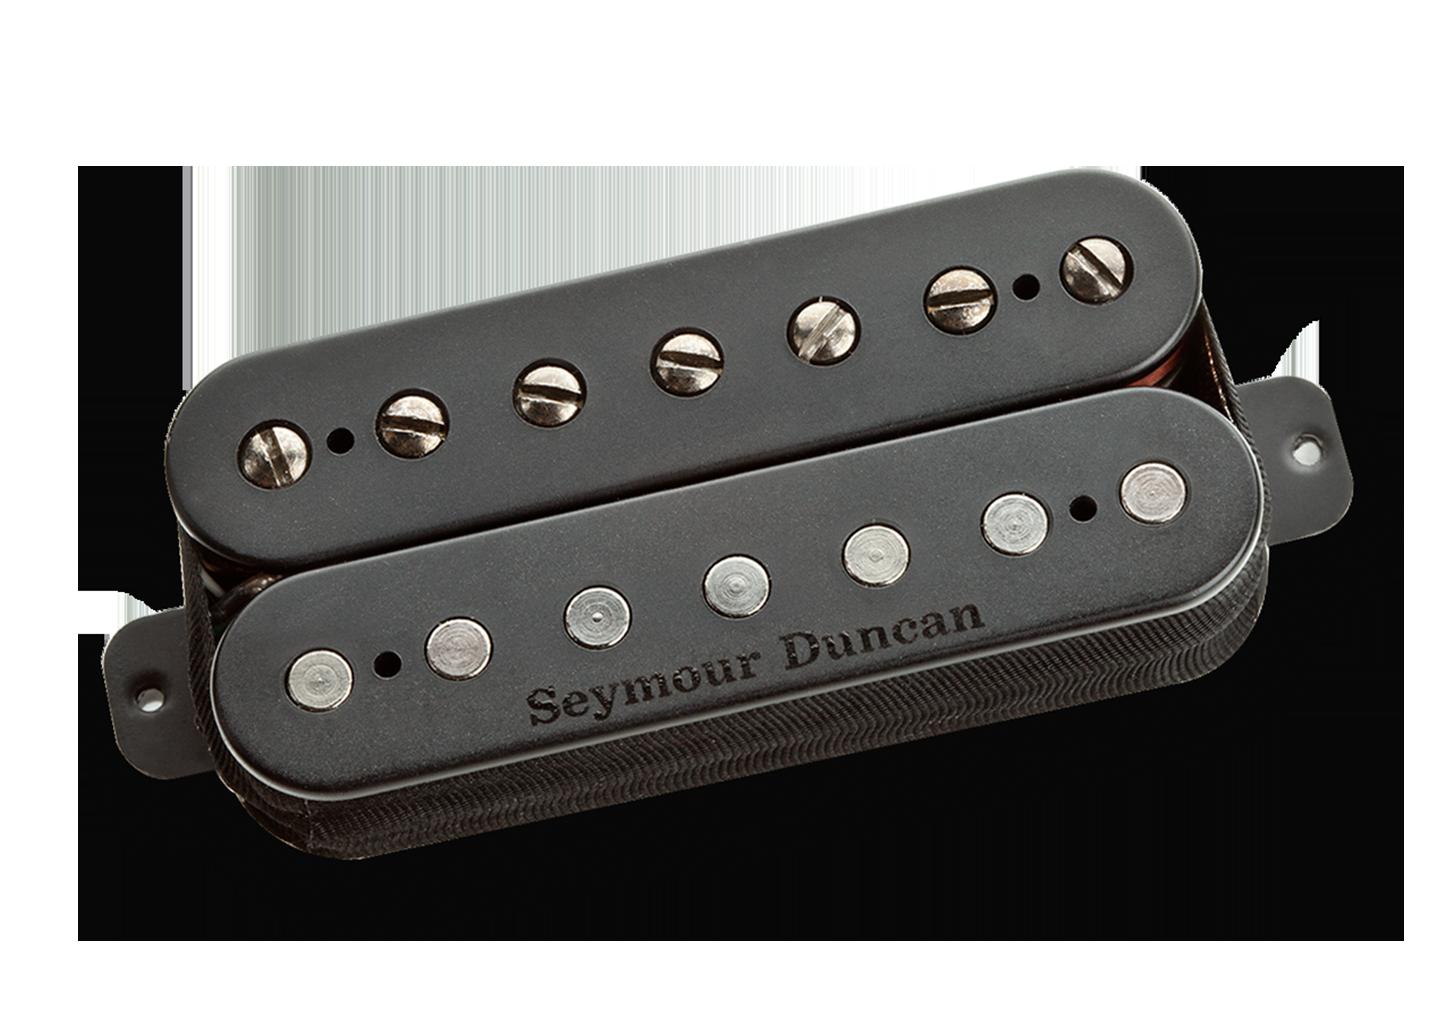 Seymour Duncan Duncan Distortion Humbucker - SH-6N Neck 7 String Passive Mount Black